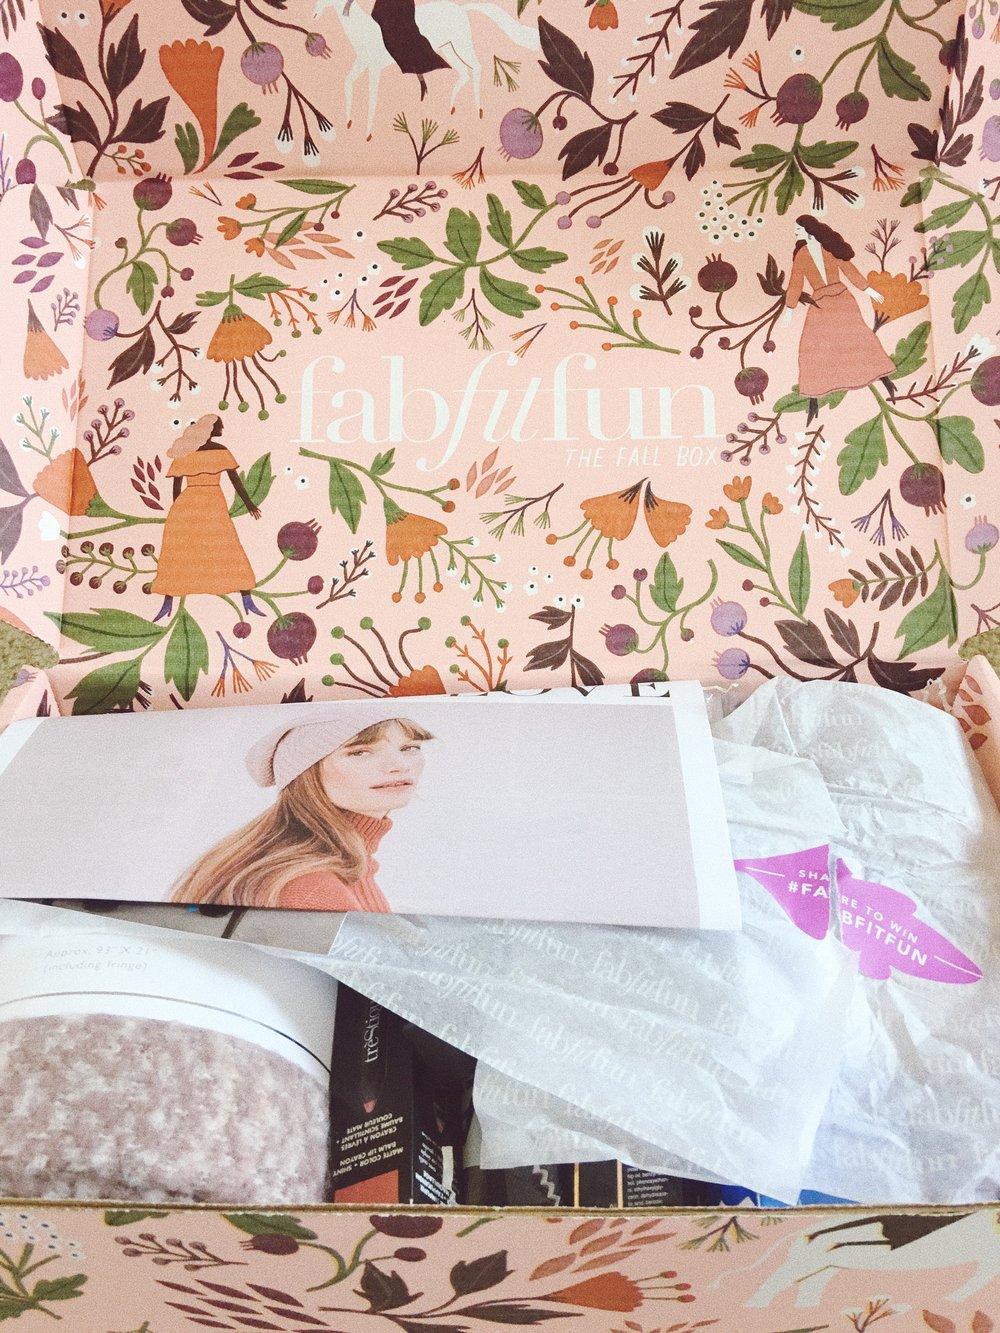 Girlfromplaya.com FabFitFun Fall 2017 Box